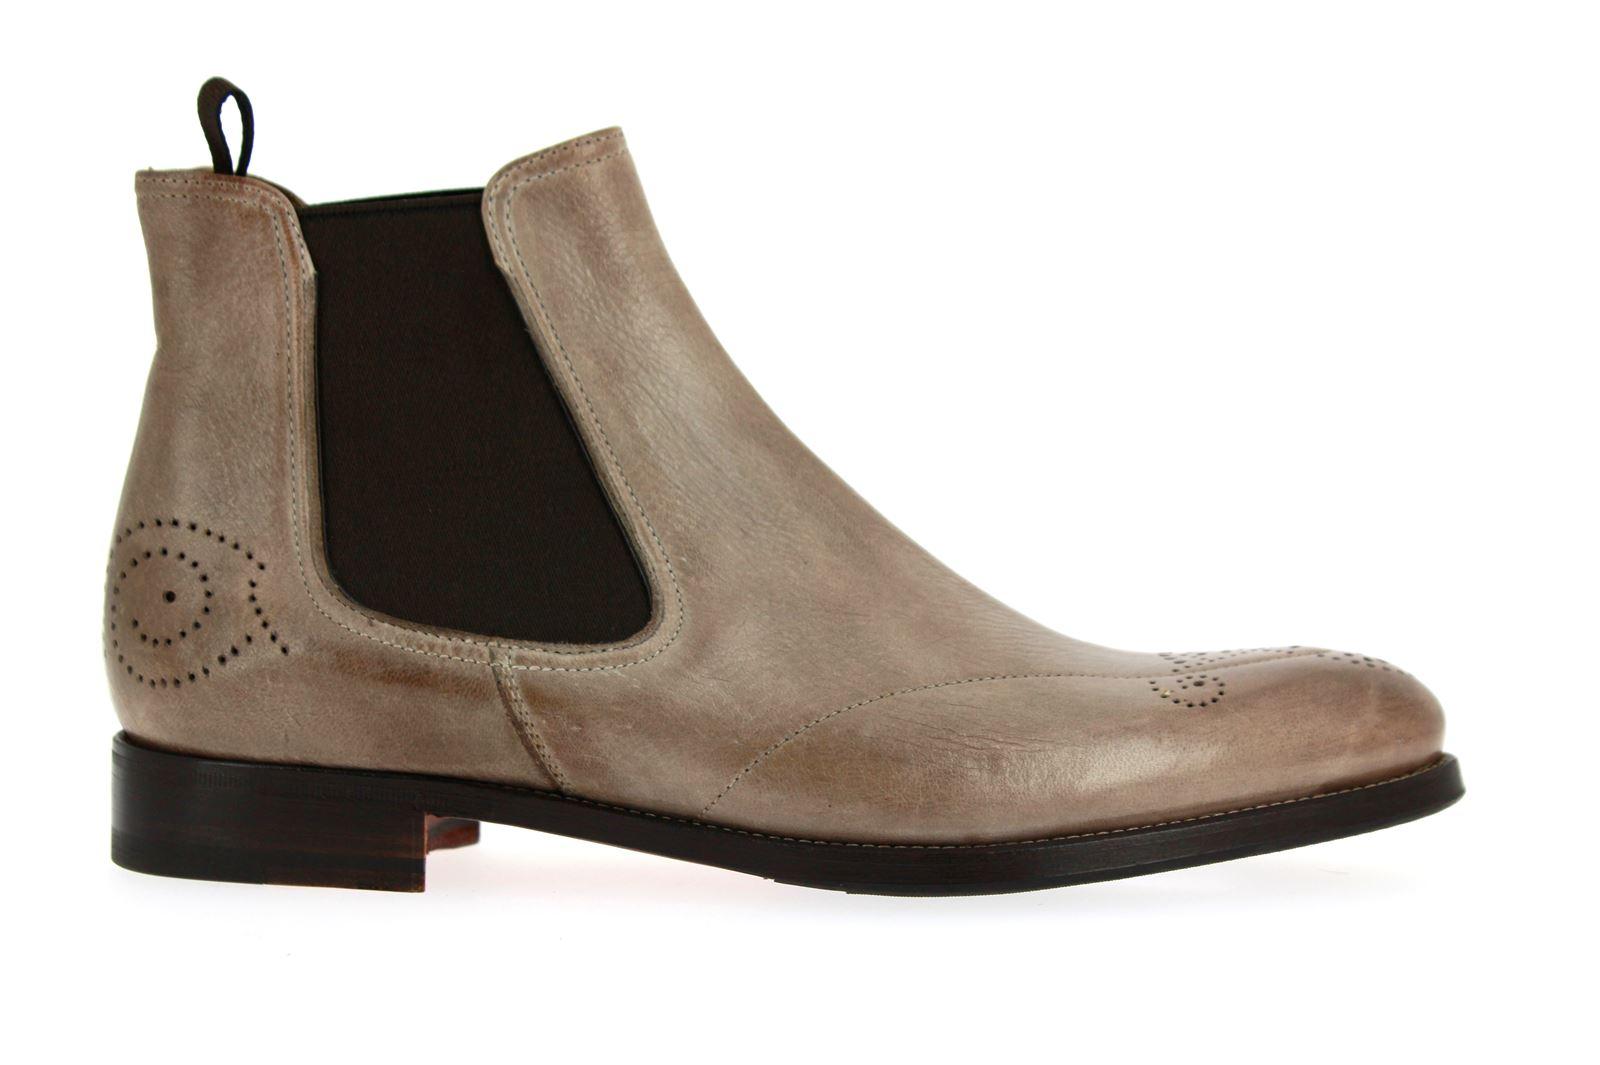 Benson's Chelsea boots ANGELA TORTORA